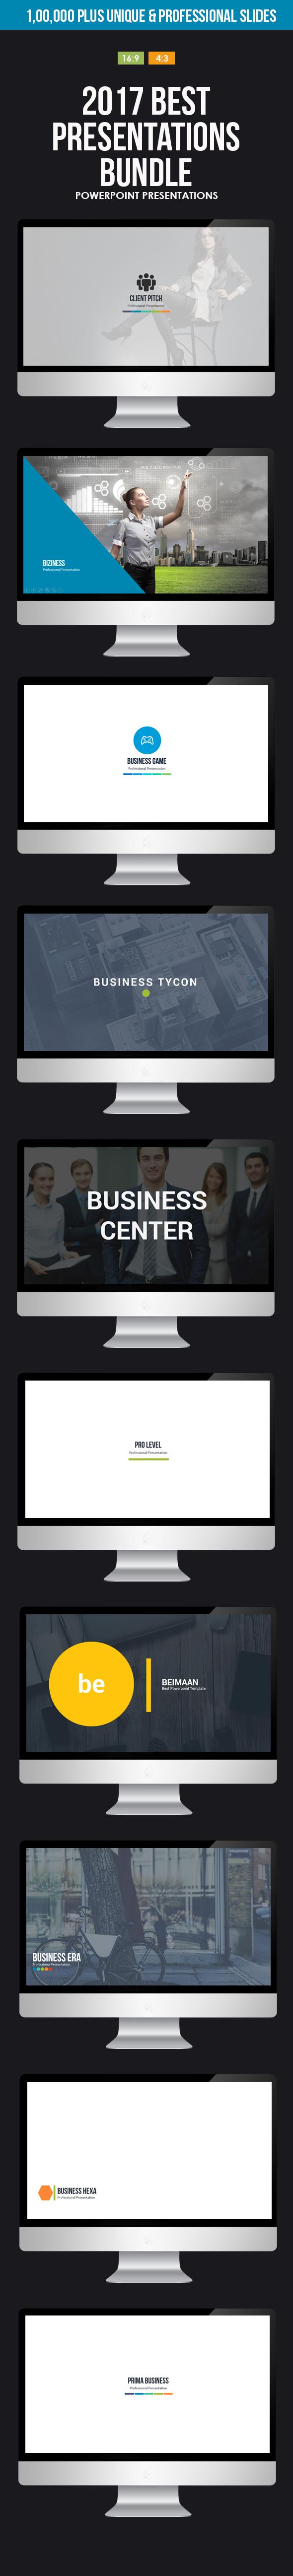 2017 Best Powerpoint Presentations Bundle - Business PowerPoint Templates